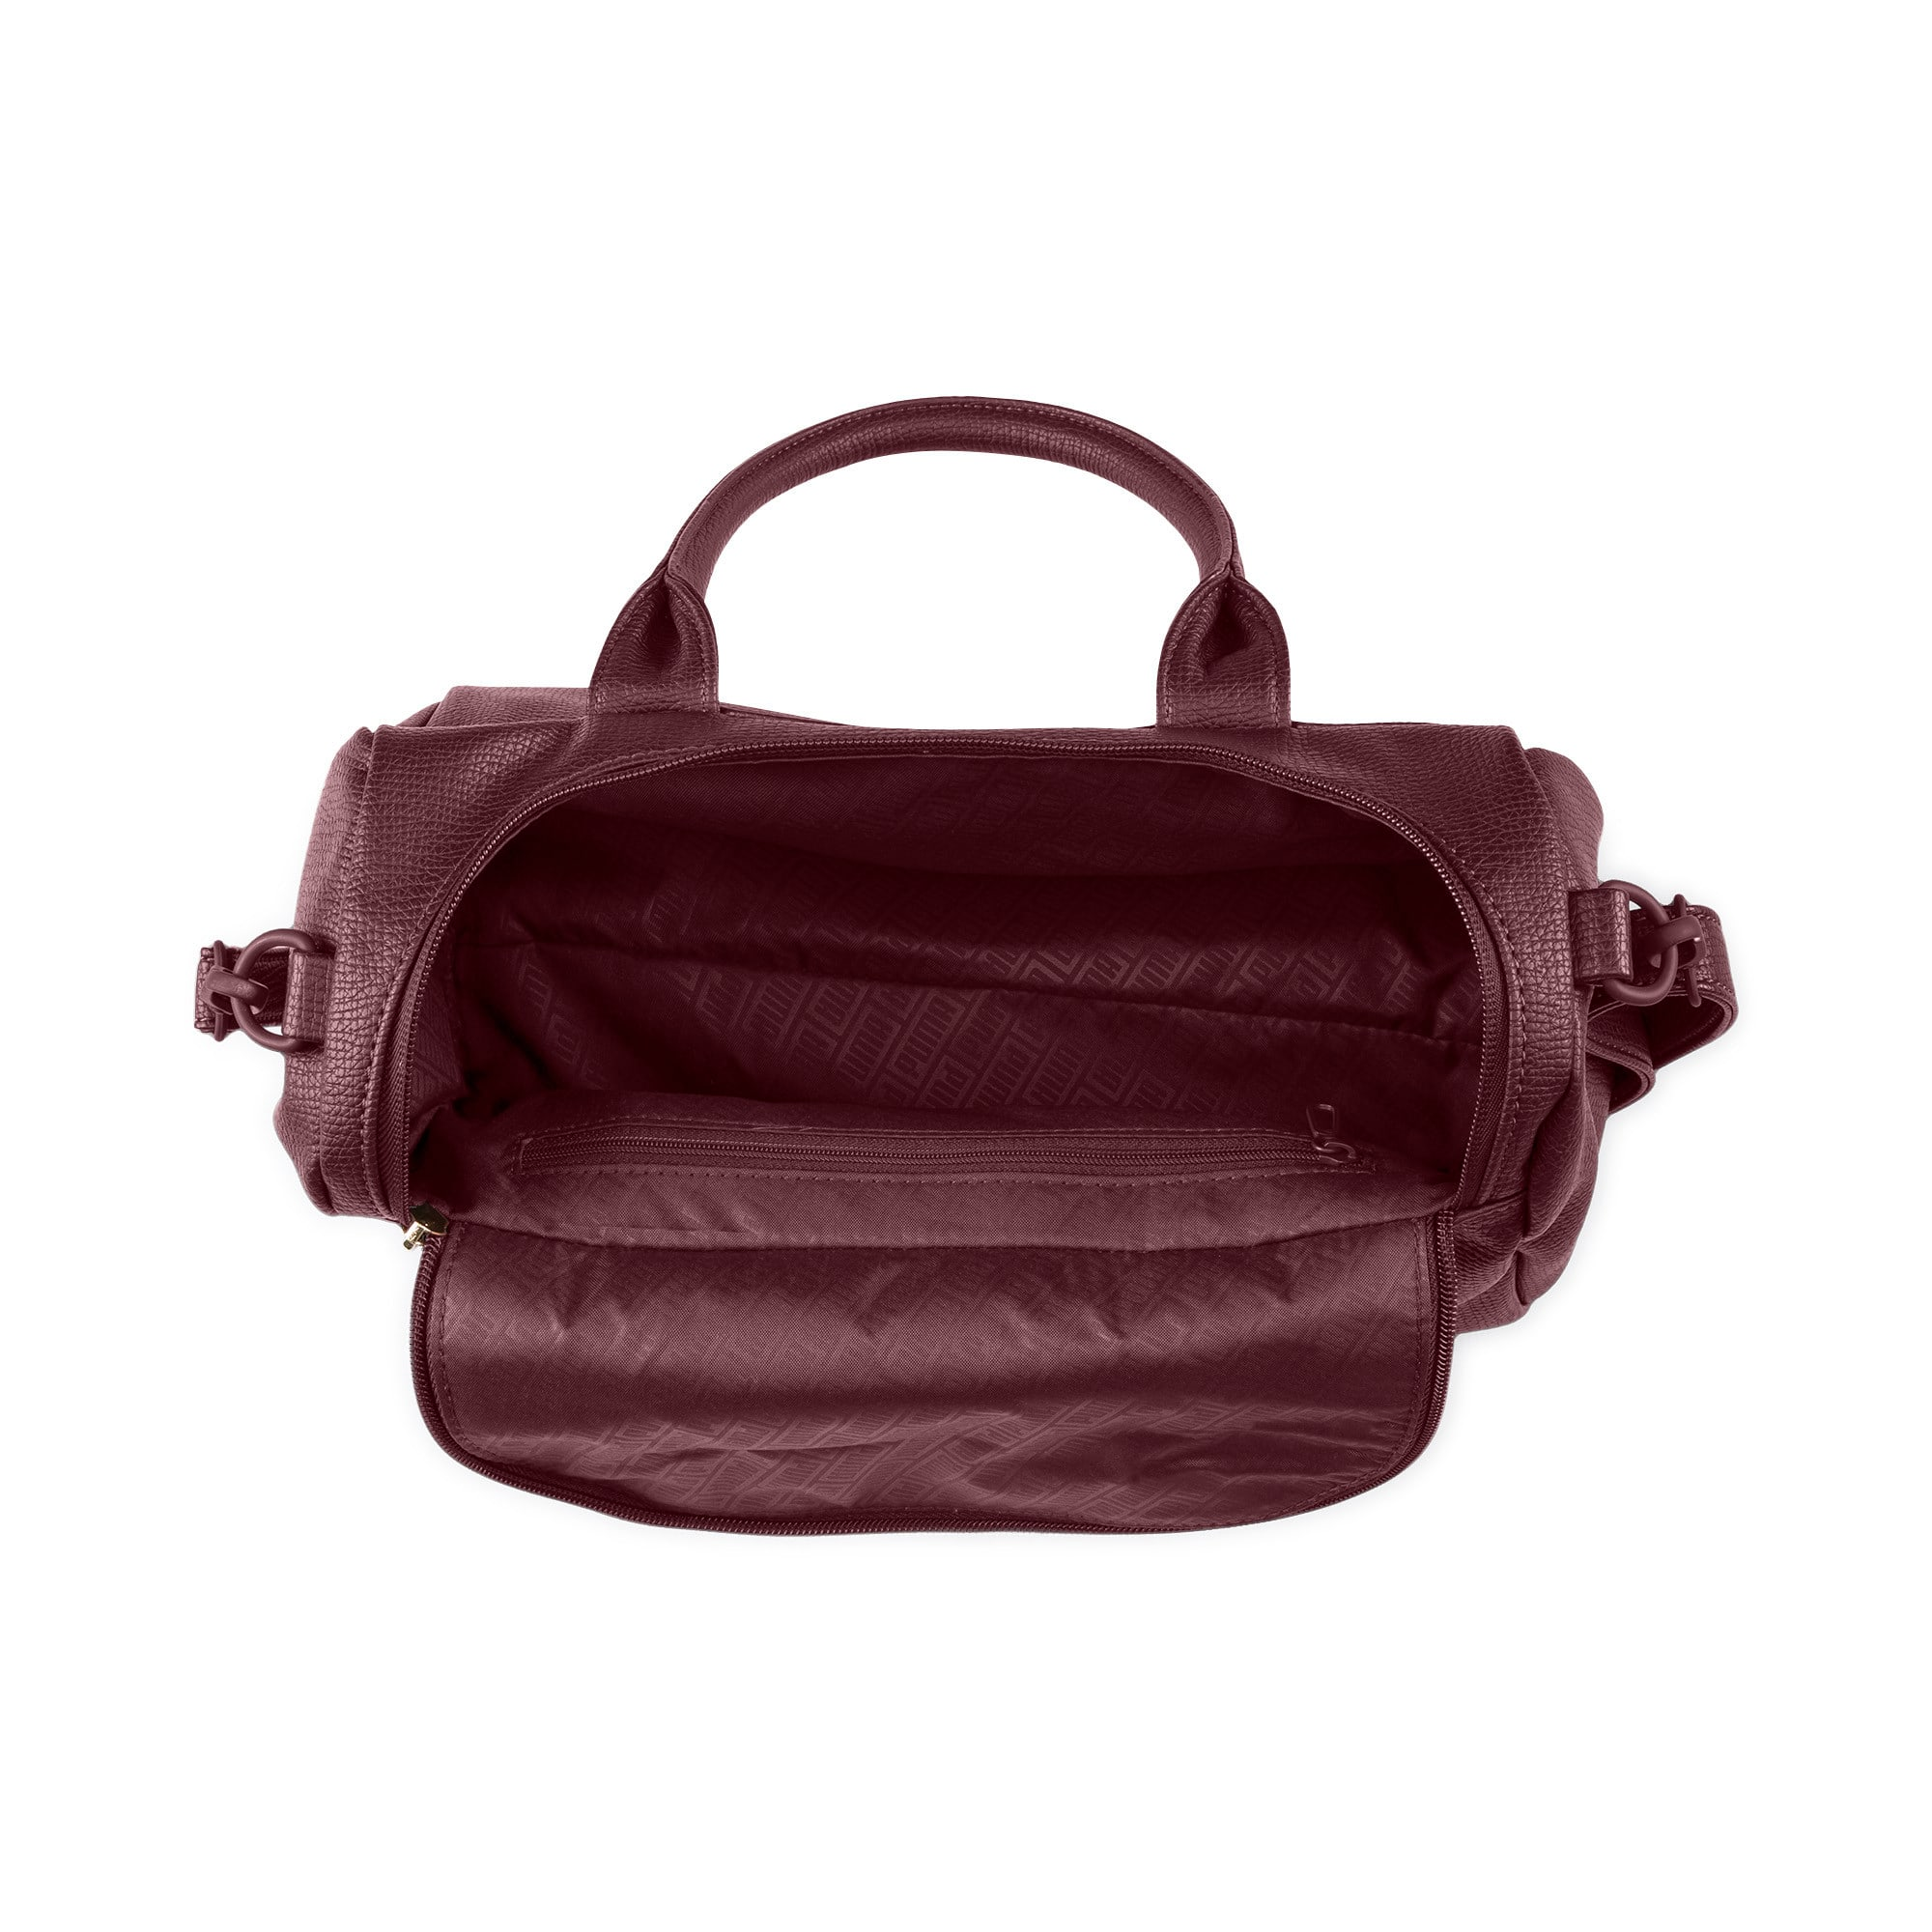 Thumbnail 4 of Ferrari Lifestyle Women's Handbag, Vineyard Wine, medium-IND